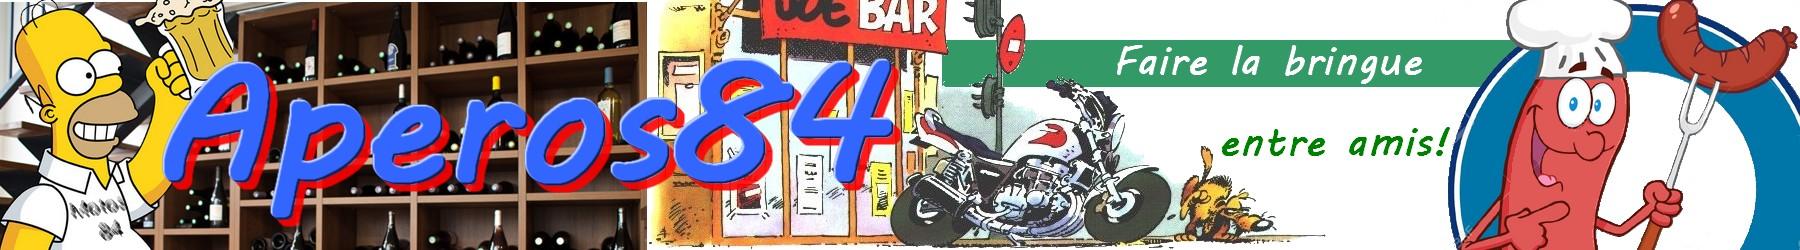 aperos84